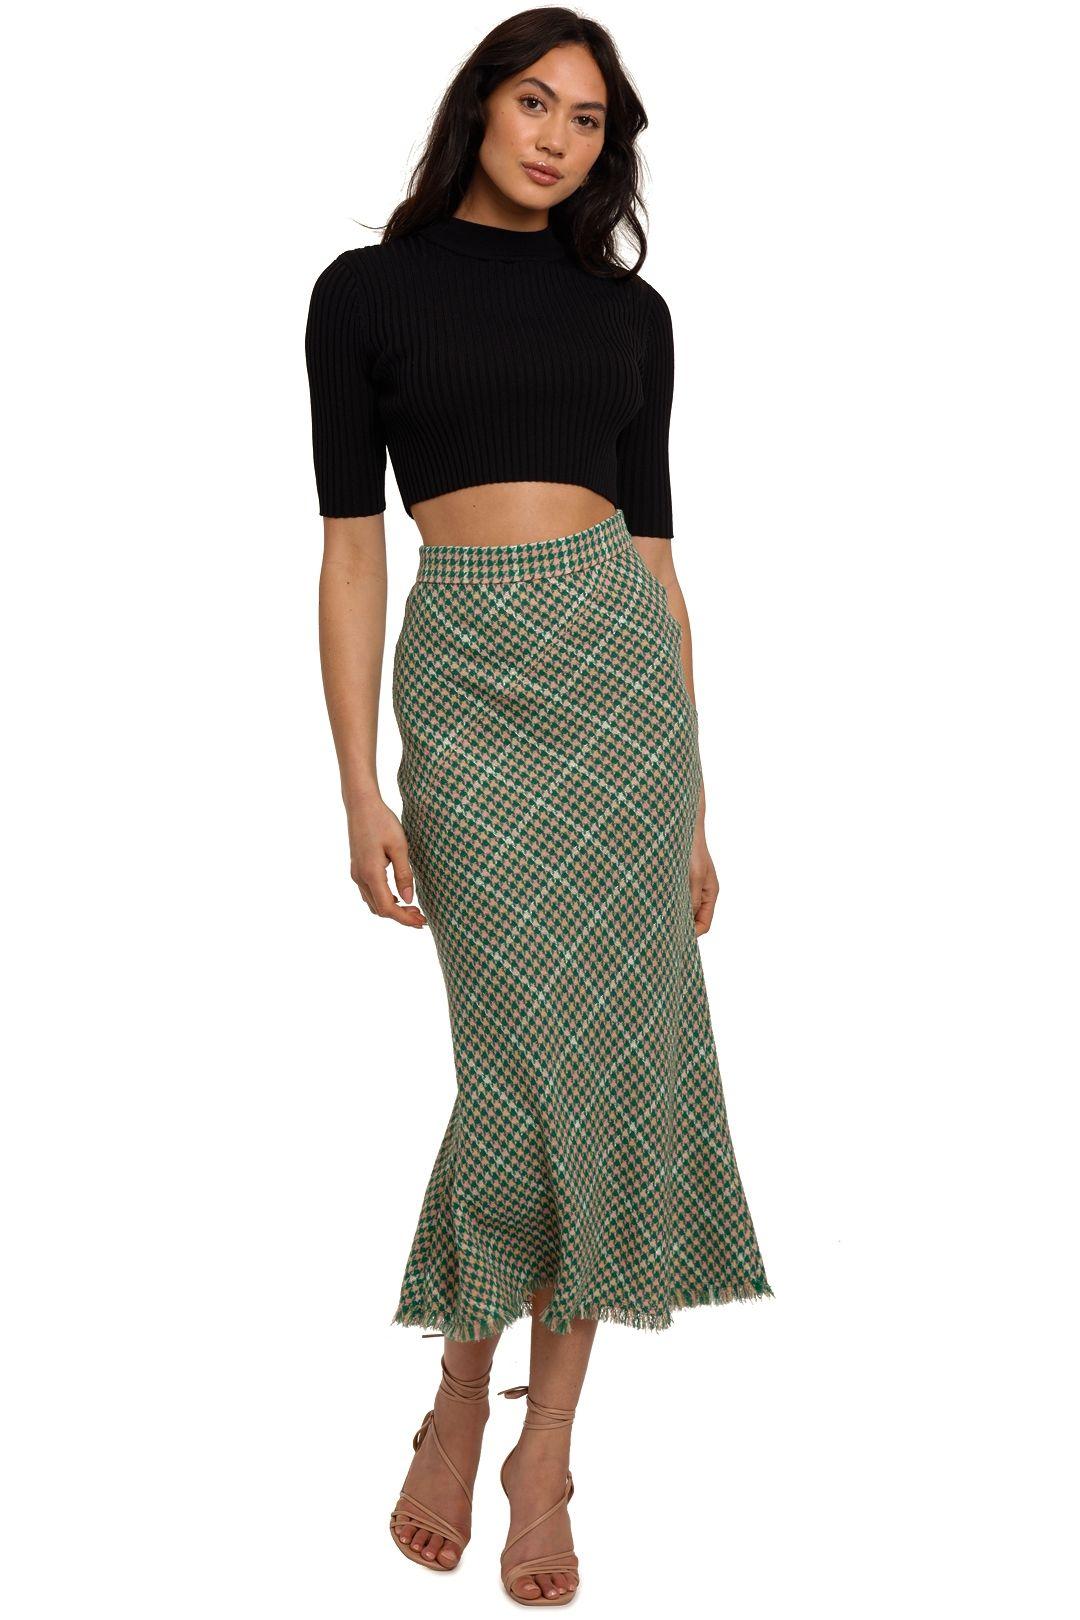 By Johnny Alex Tweed Bias Skirt Green midi